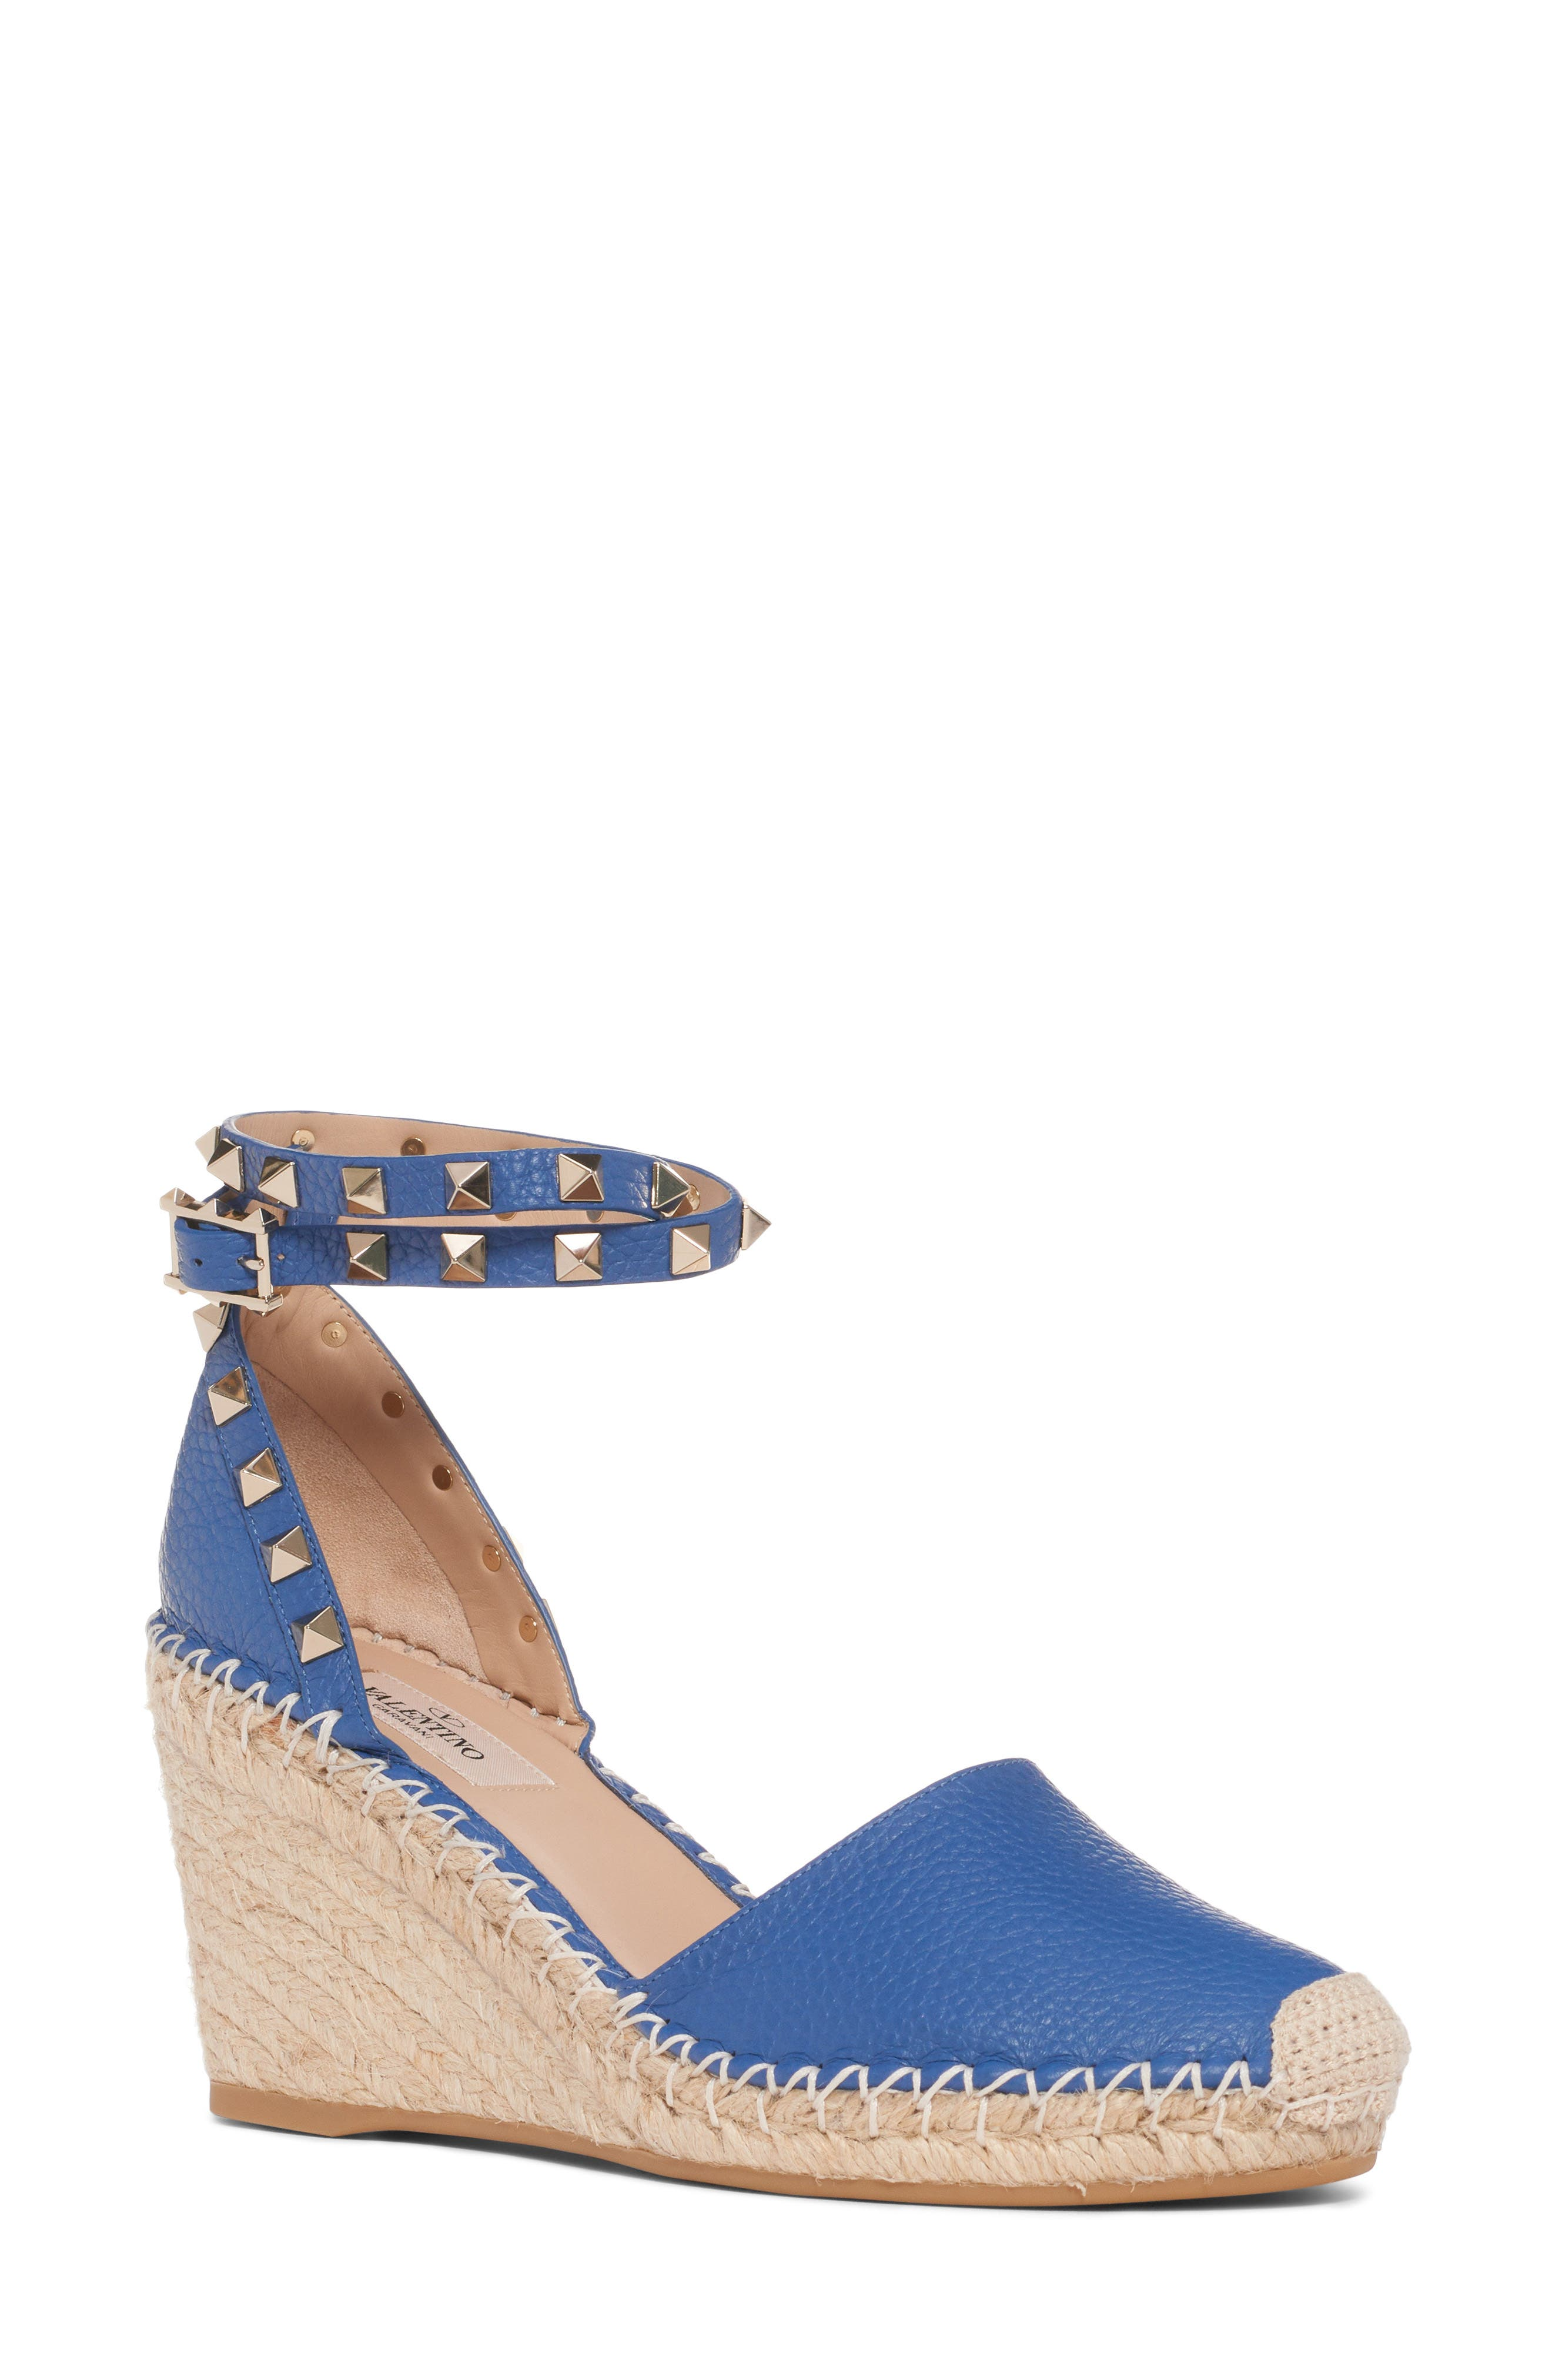 52a709b9d15 Valentino Women s Blue Shoes